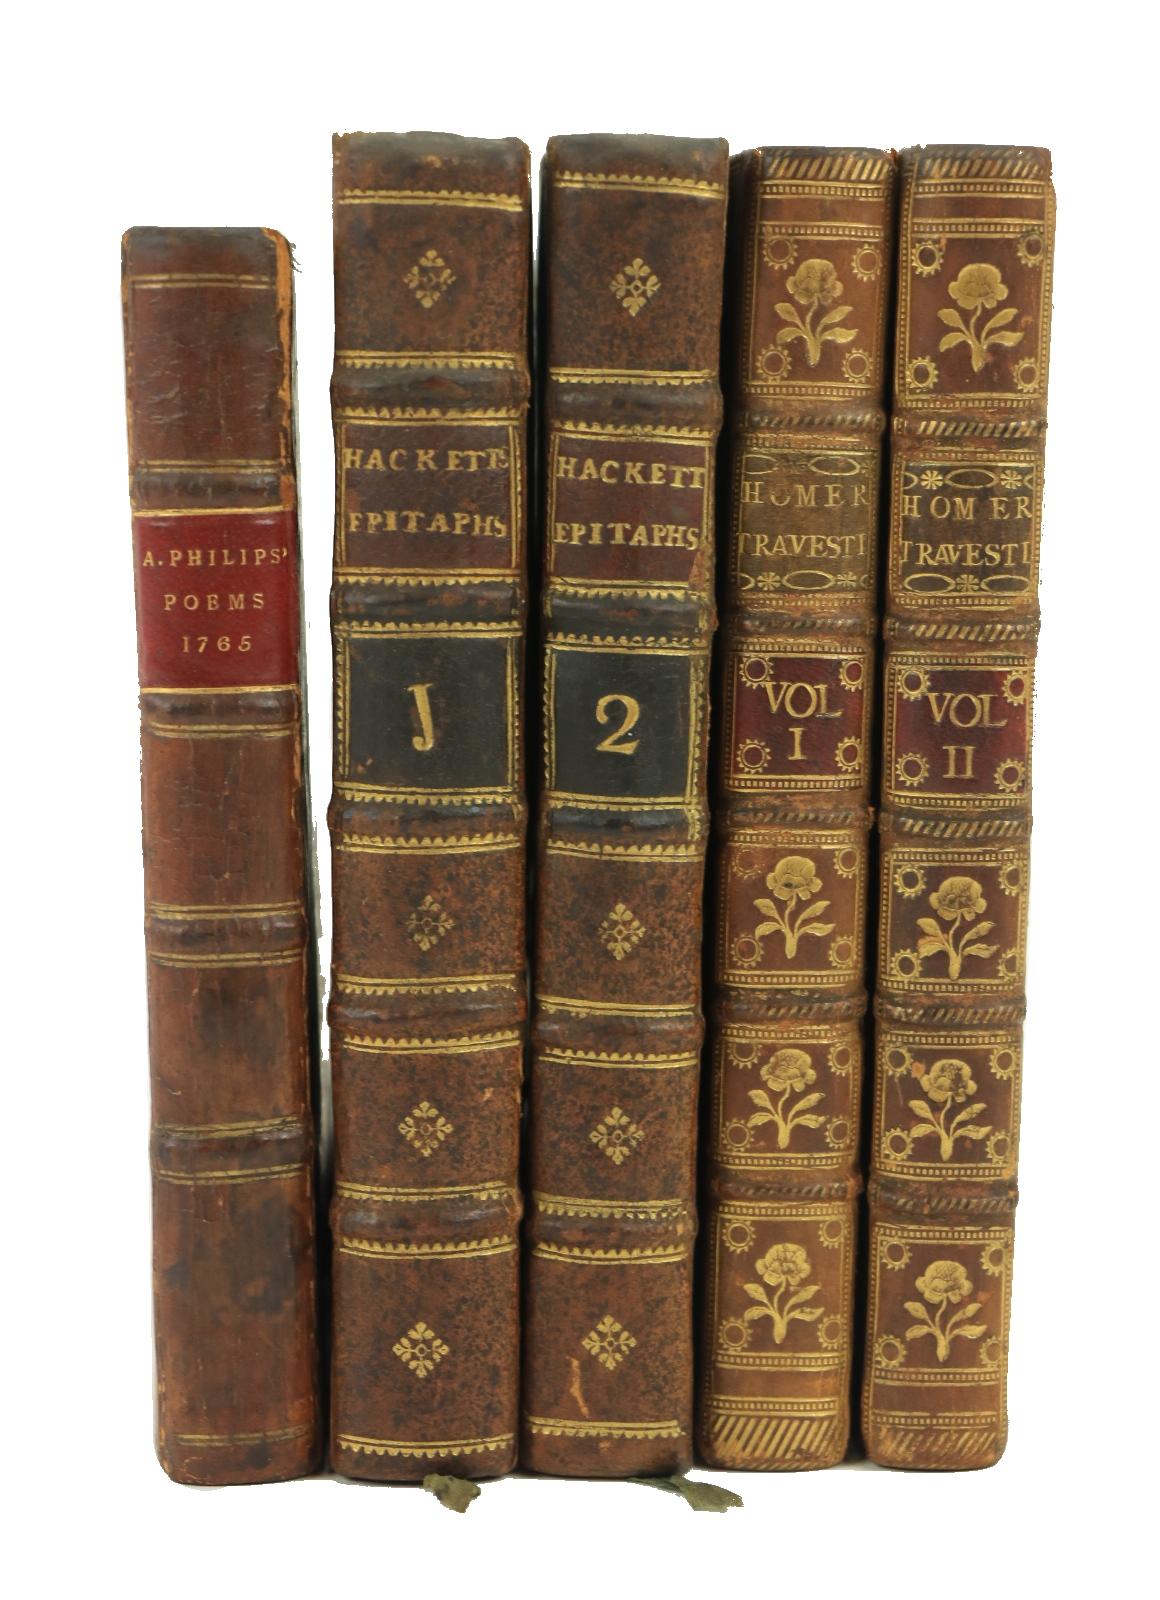 [Brydges (Thos.)]ÿA Burlesque Translationÿof Homer, 2 vols. 12mo L. 1770.ÿThird Edn.,ÿ2 engd.